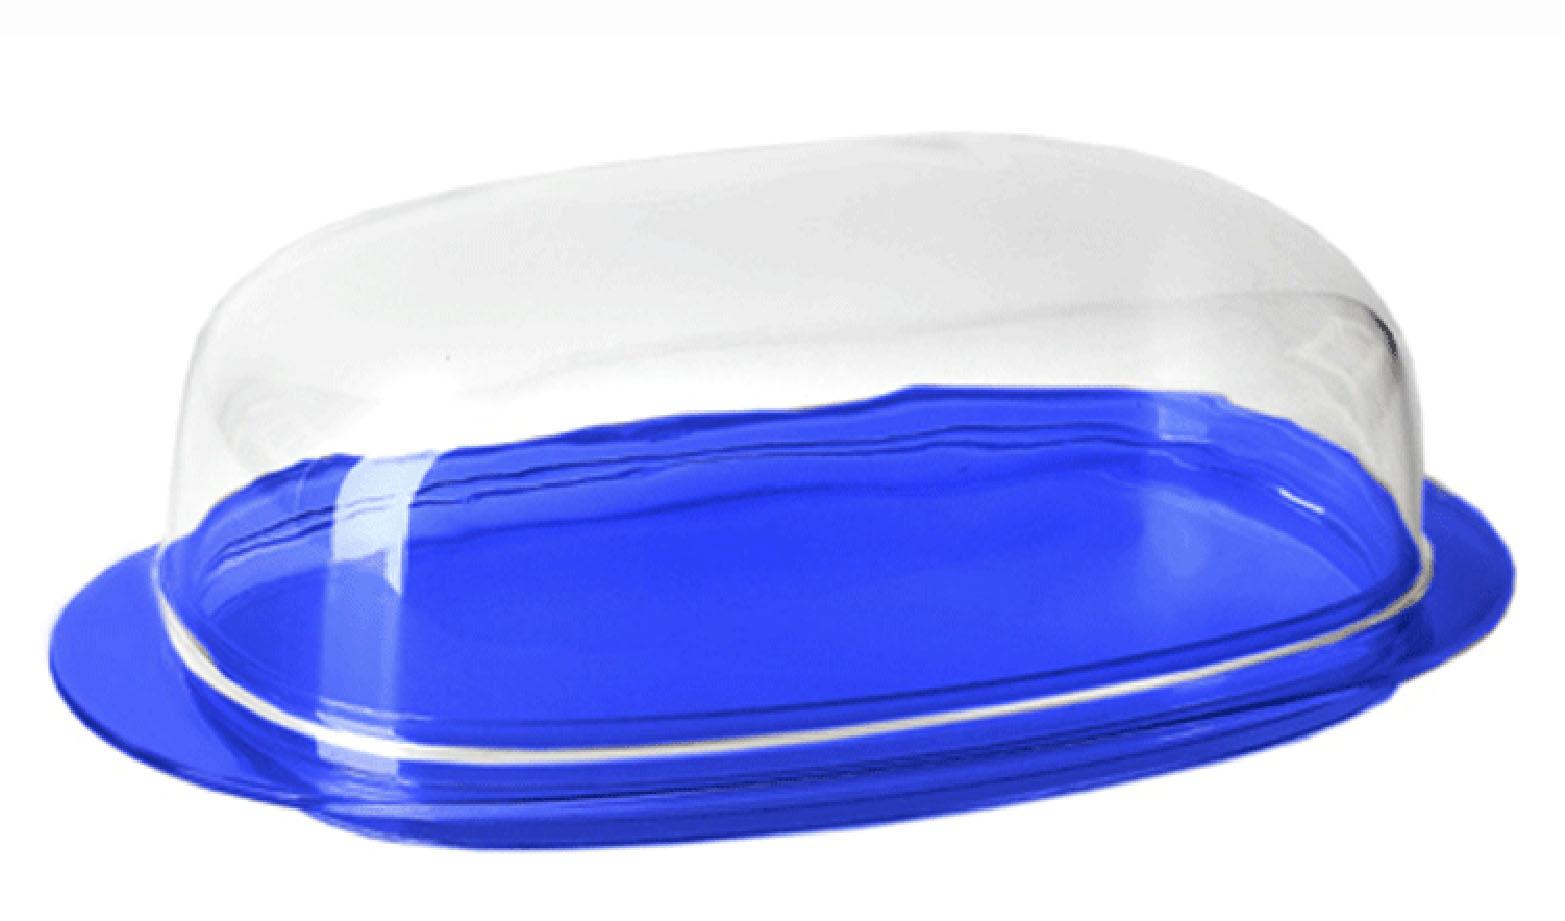 Масленка Кристалл, Синий прозрачныйМ 1126Масленка Кристалл, Синий прозрачный